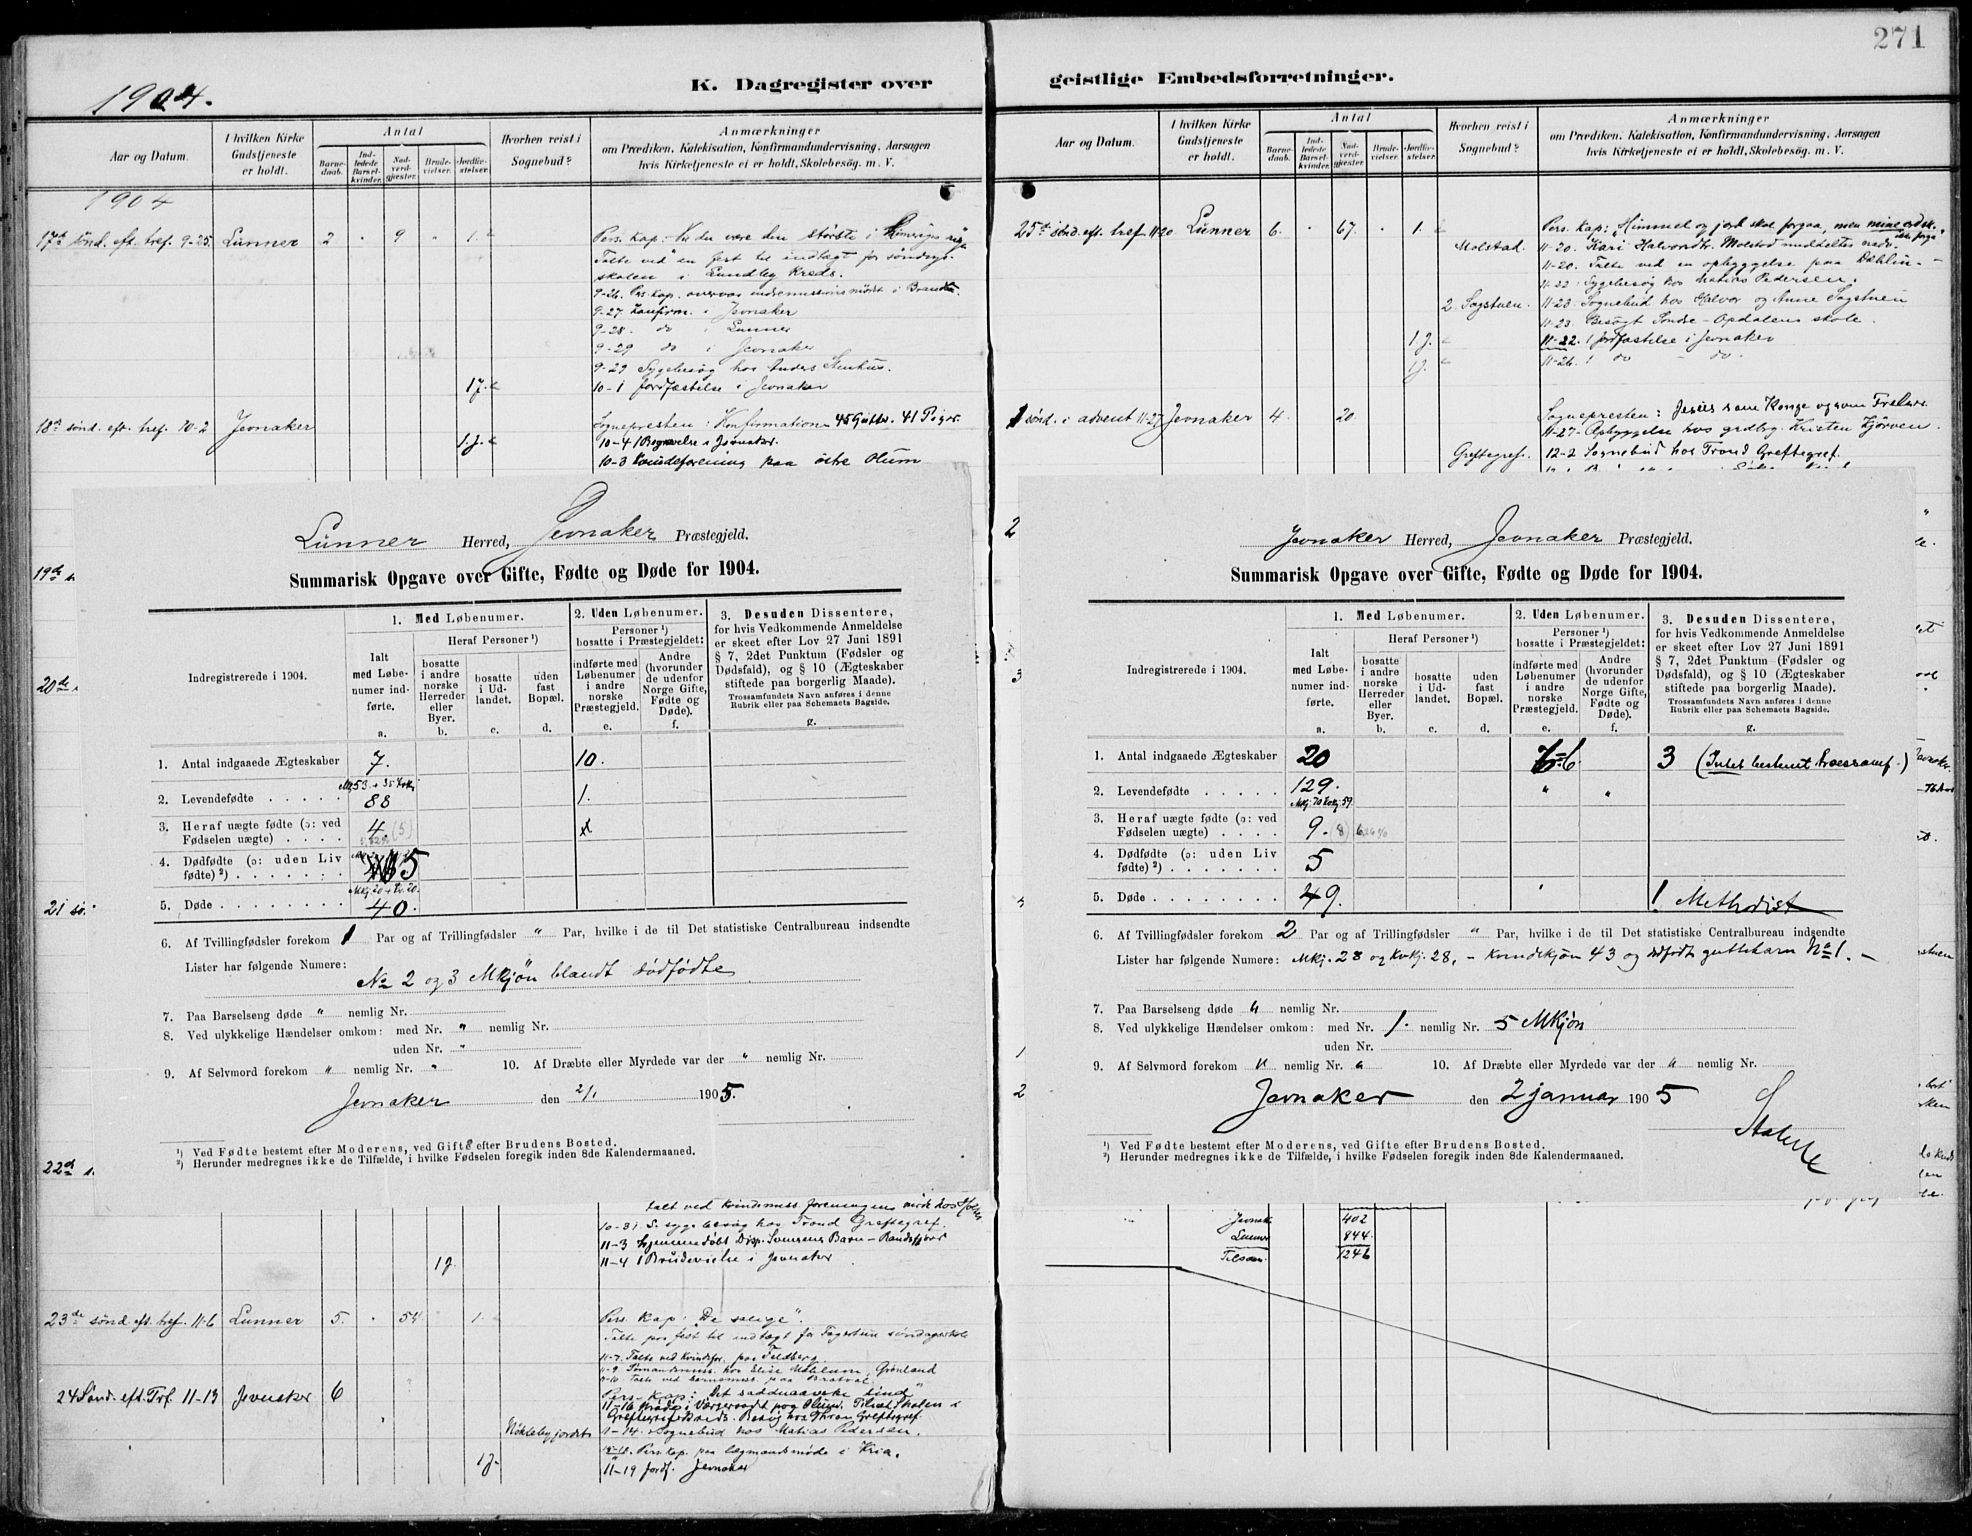 SAH, Jevnaker prestekontor, Ministerialbok nr. 11, 1902-1913, s. 271